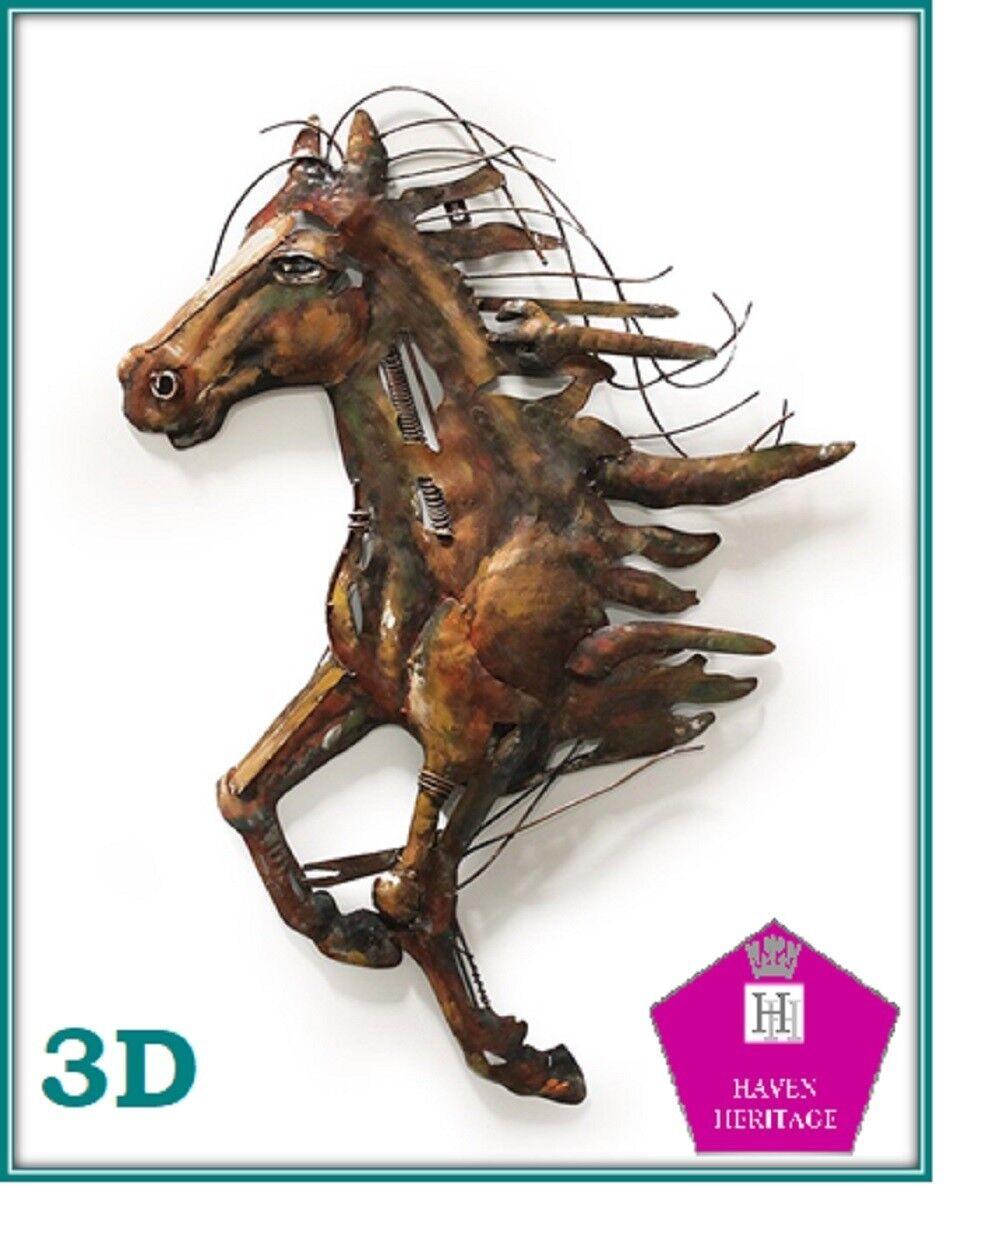 3D LARGE METAL WALL ART METAL WALL SCULPTURE Abstract Horse D1B